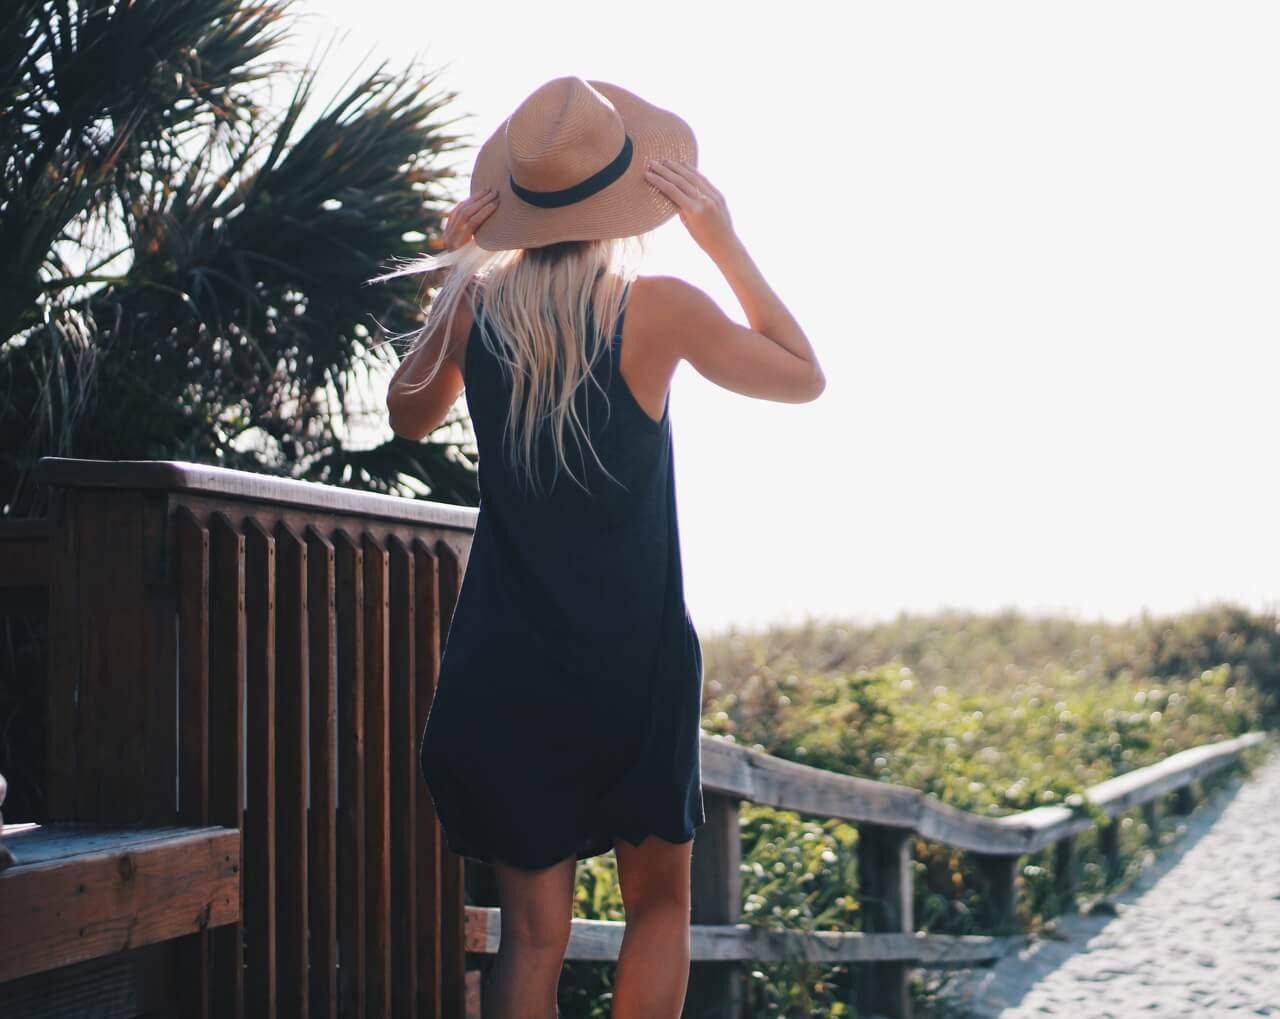 tumblr opc0mcWkrL1uqdy2lo1 1280 - Beach Tank Dress - The Perfect Dress for Summer